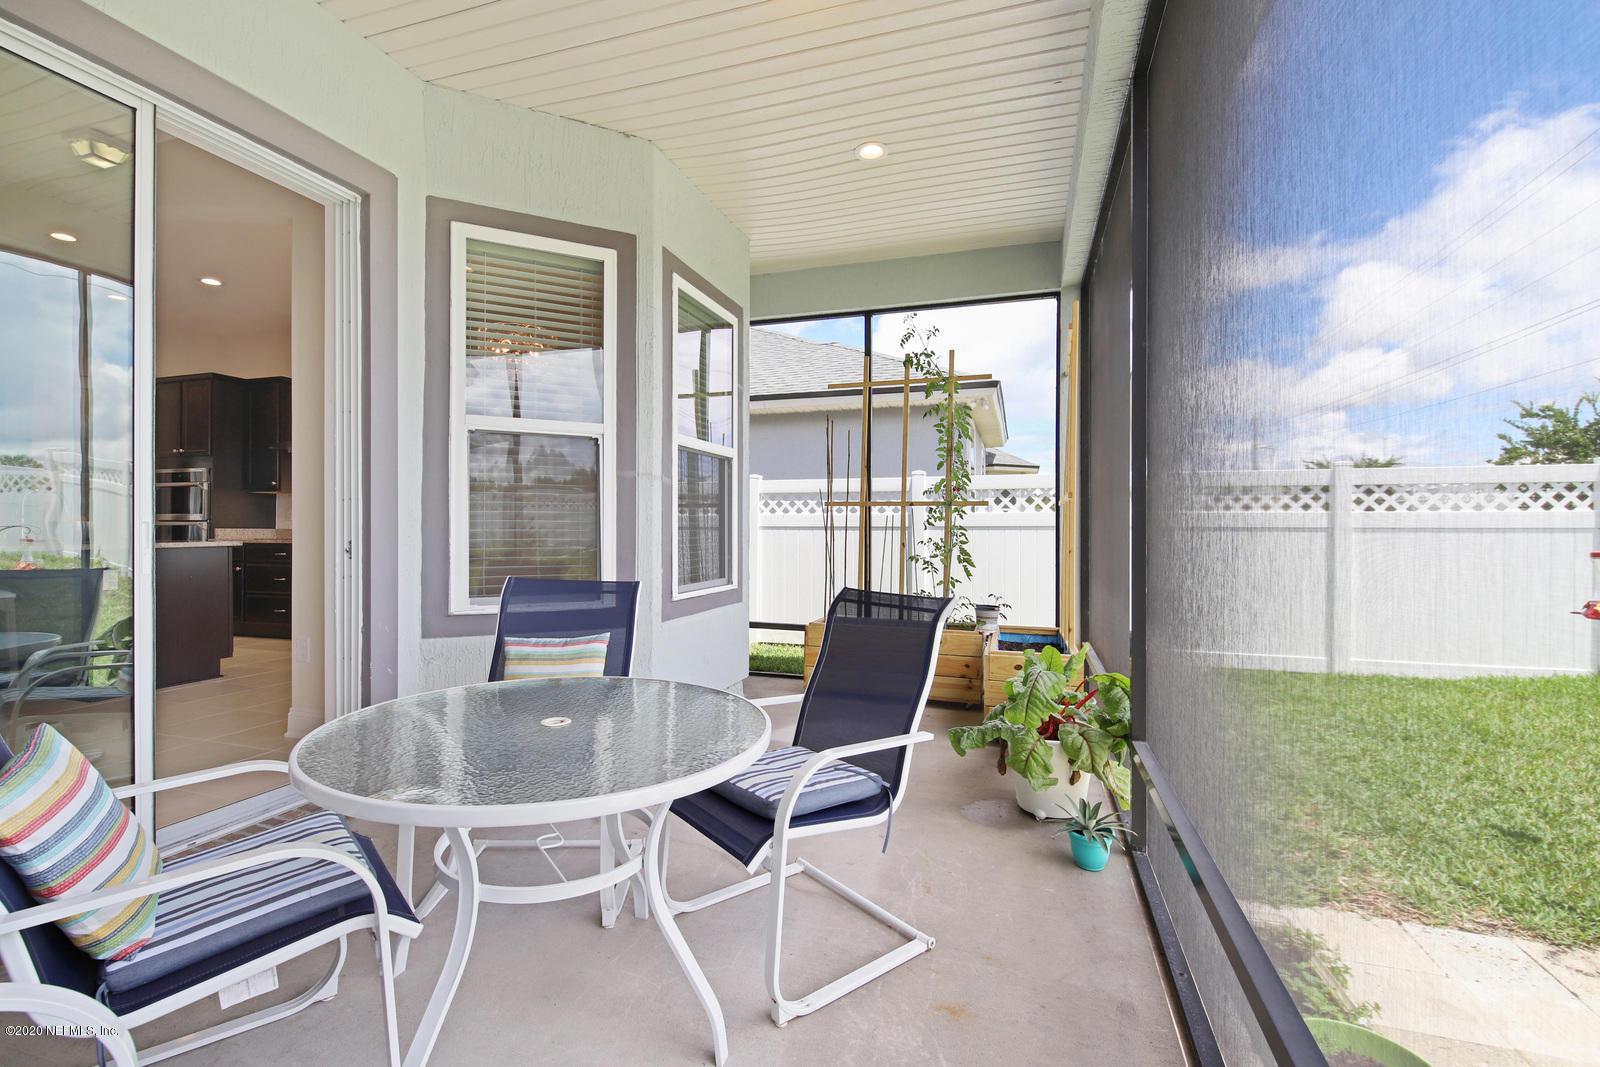 3931 ARBOR MILL, ORANGE PARK, FLORIDA 32065, 4 Bedrooms Bedrooms, ,2 BathroomsBathrooms,Residential,For sale,ARBOR MILL,1055530